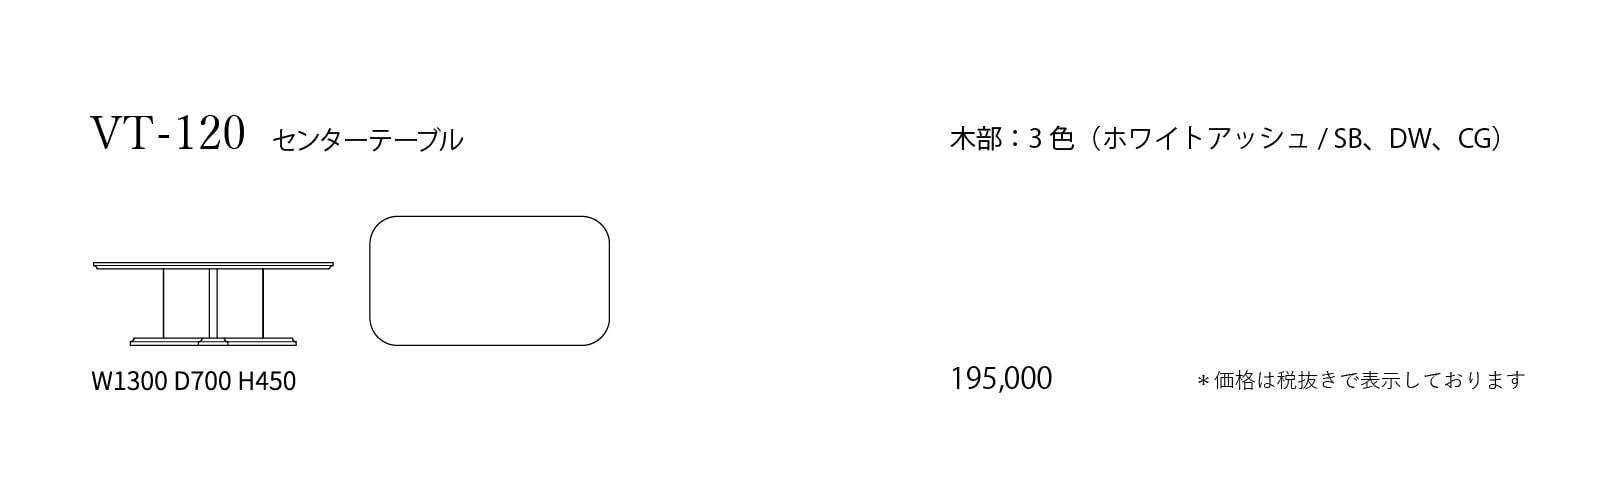 VT-120 Price List